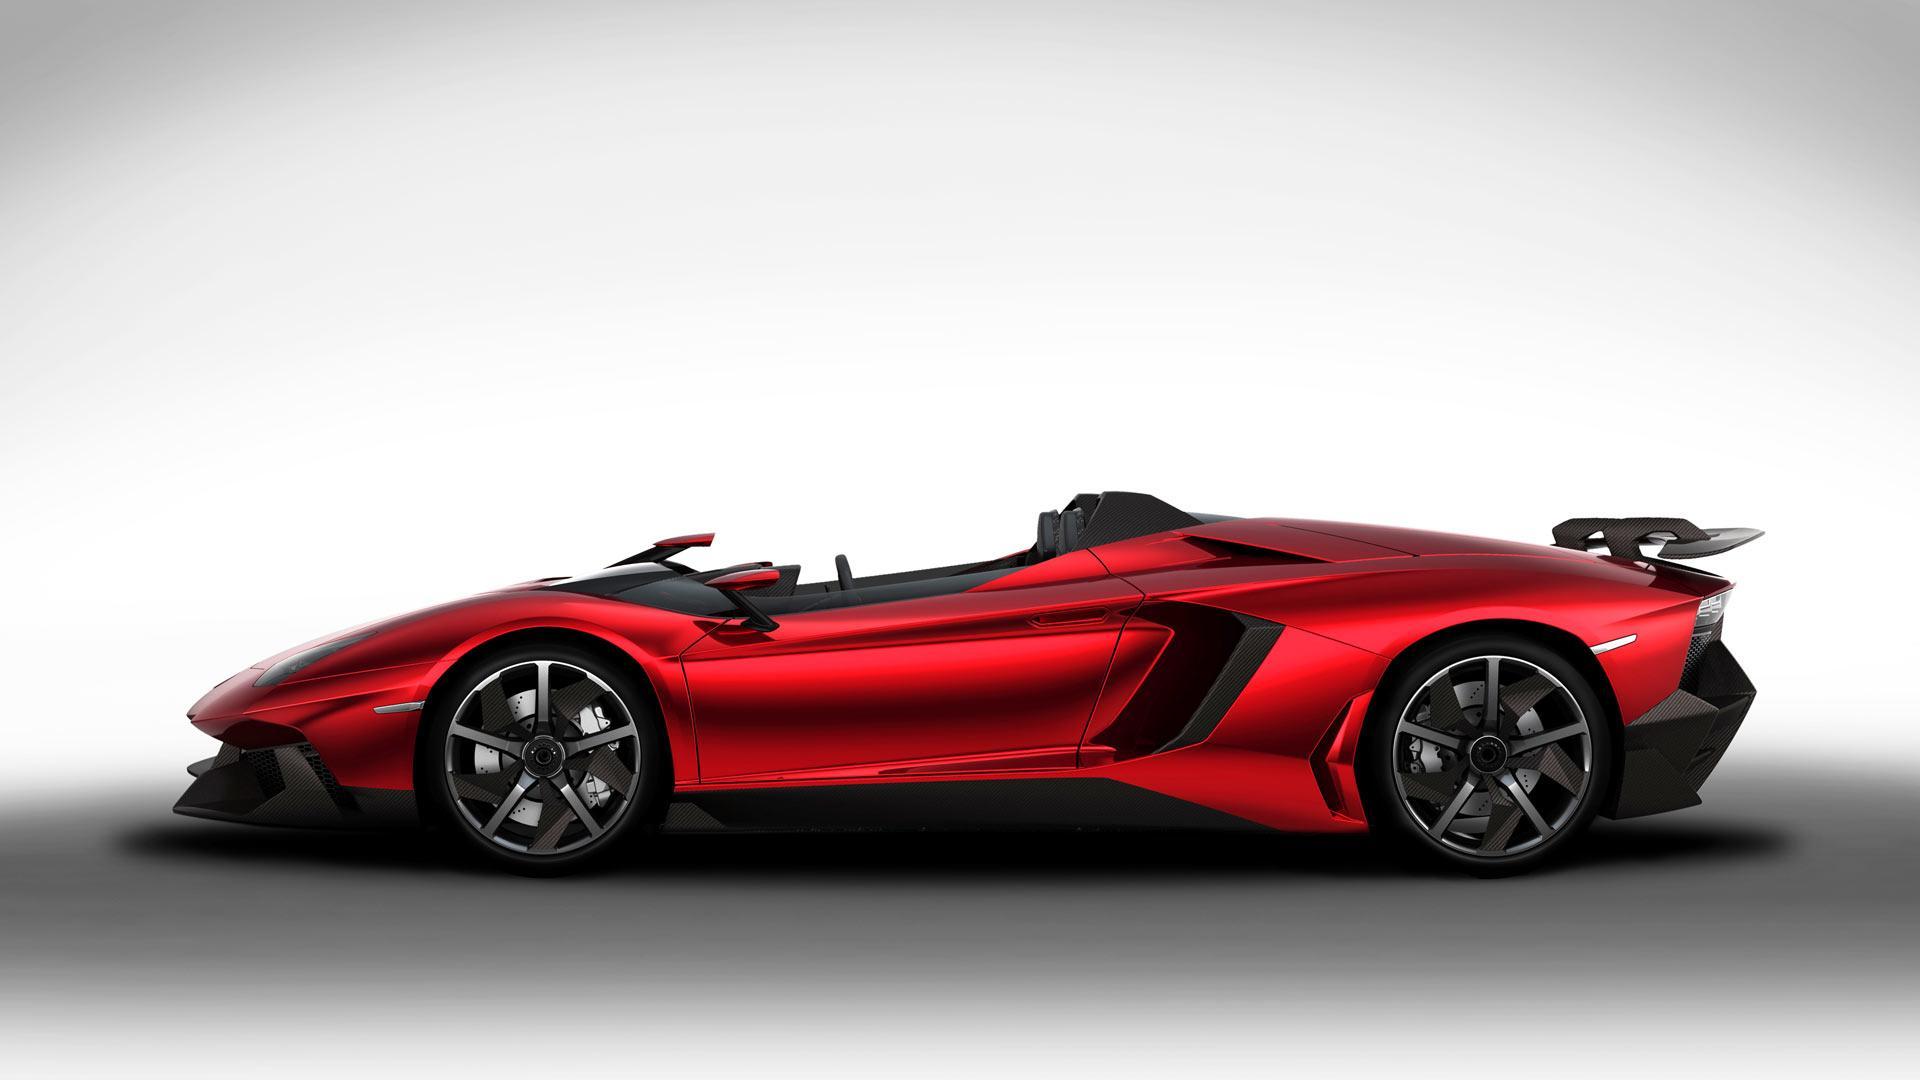 Lamborghini Aventador J - Car Body Design